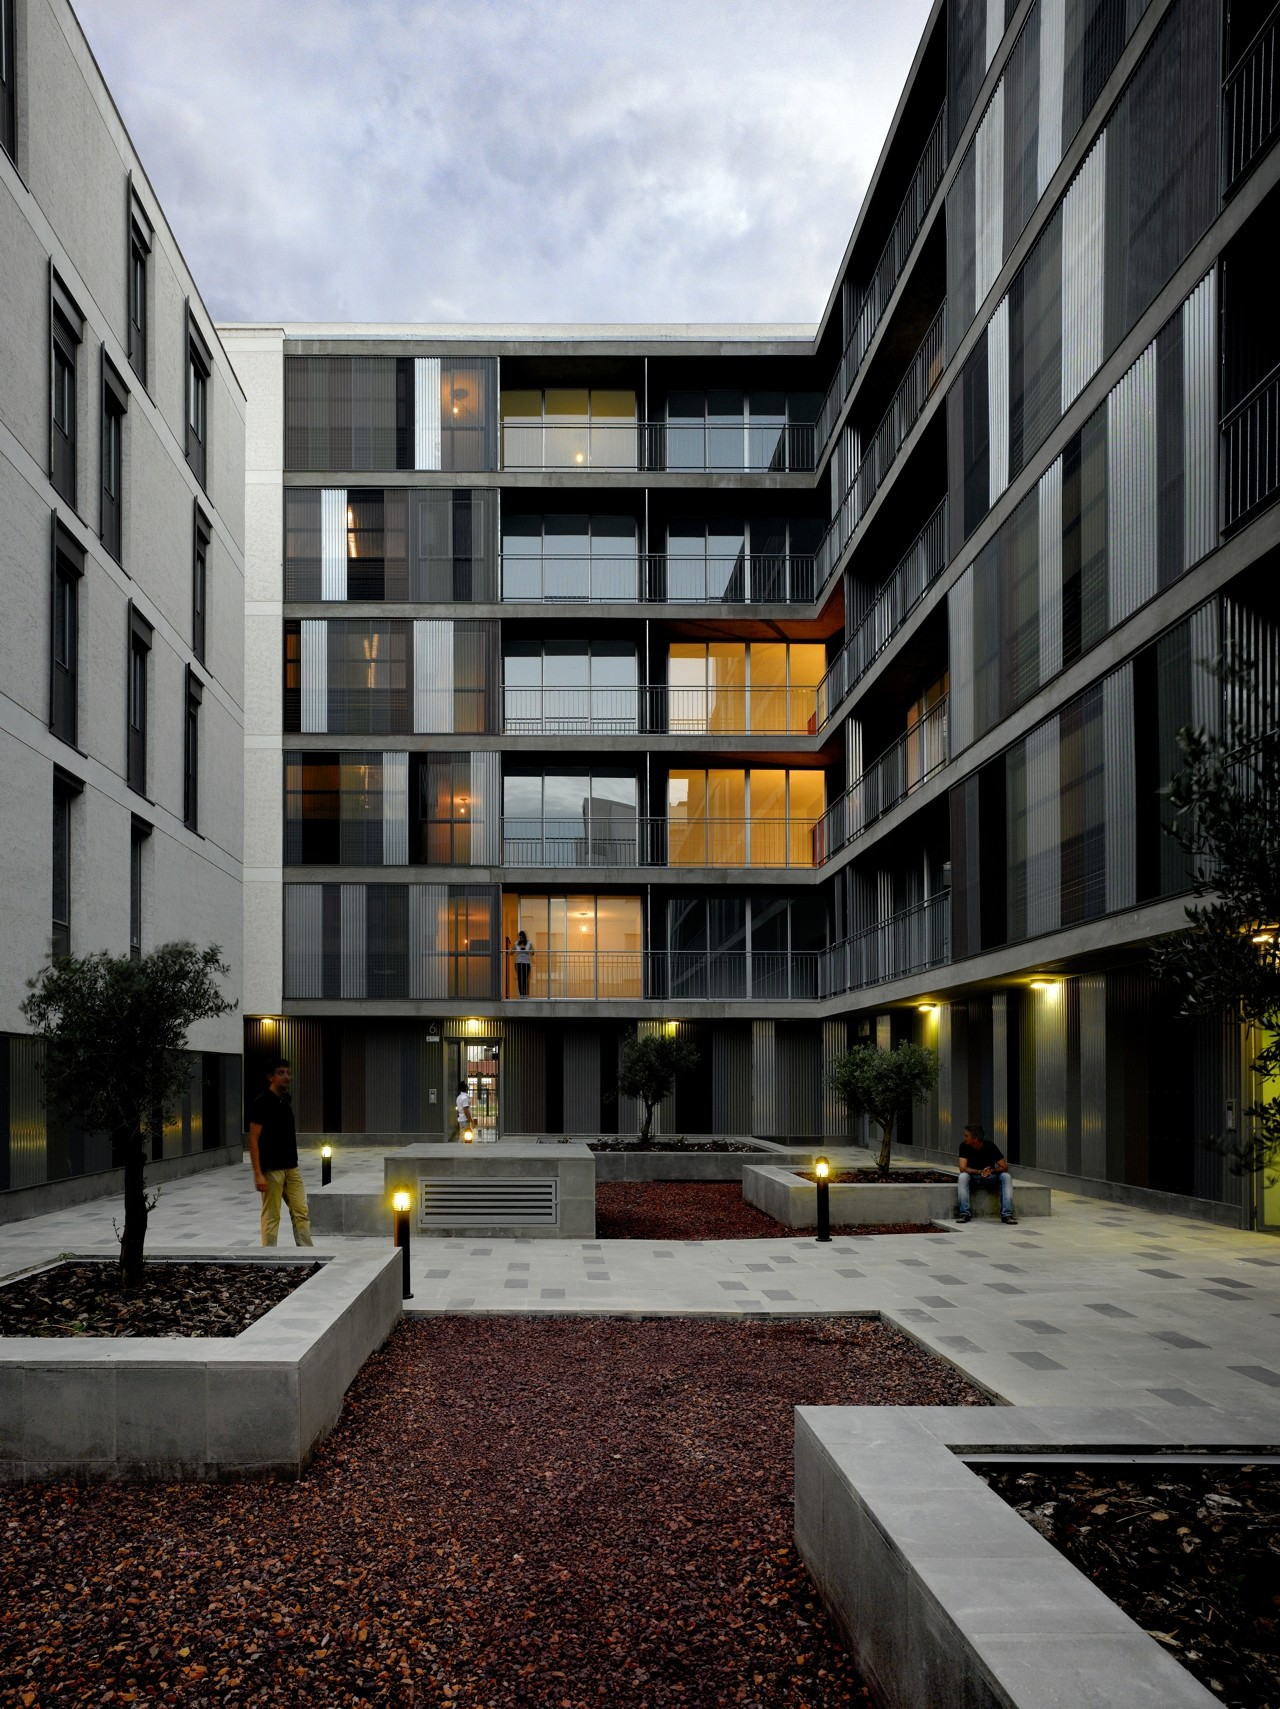 46 viviendas sociales gabriel verd plataforma arquitectura for Plataforma arquitectura